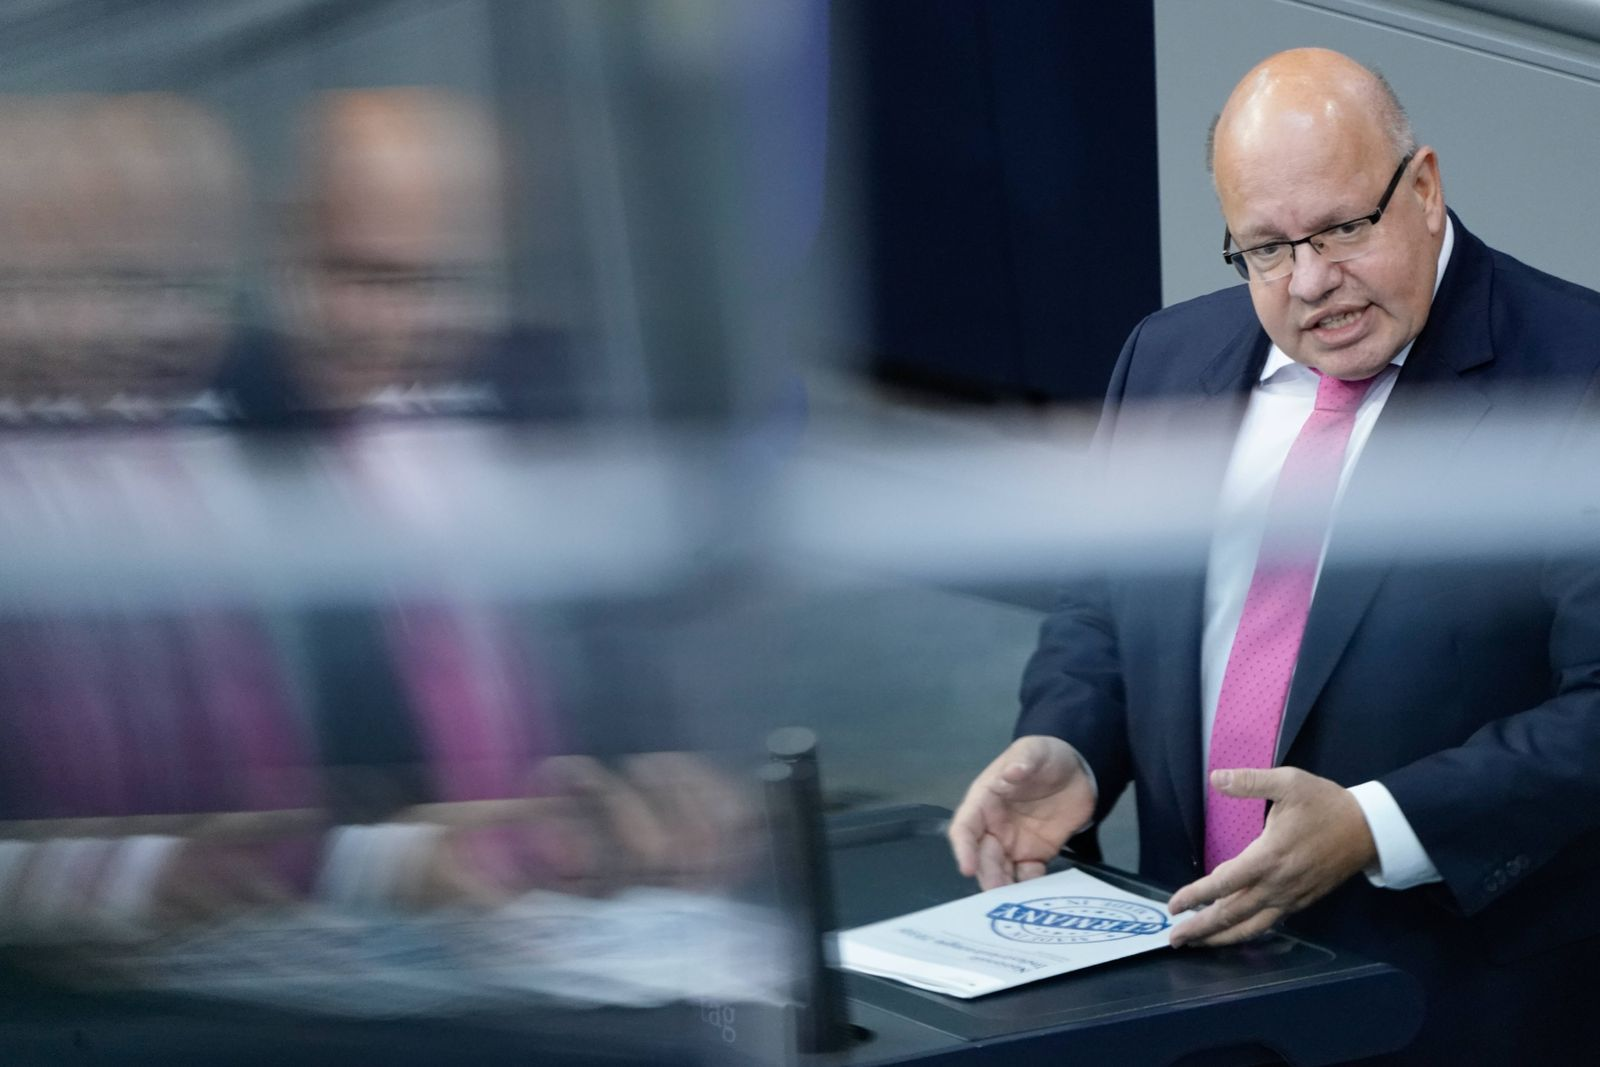 173. Bundestagssitzung am 10.09.2020 in Berlin Aktuell, 10.09.2020, Berlin Peter Altmaier der Bundesminister fuer Wirts